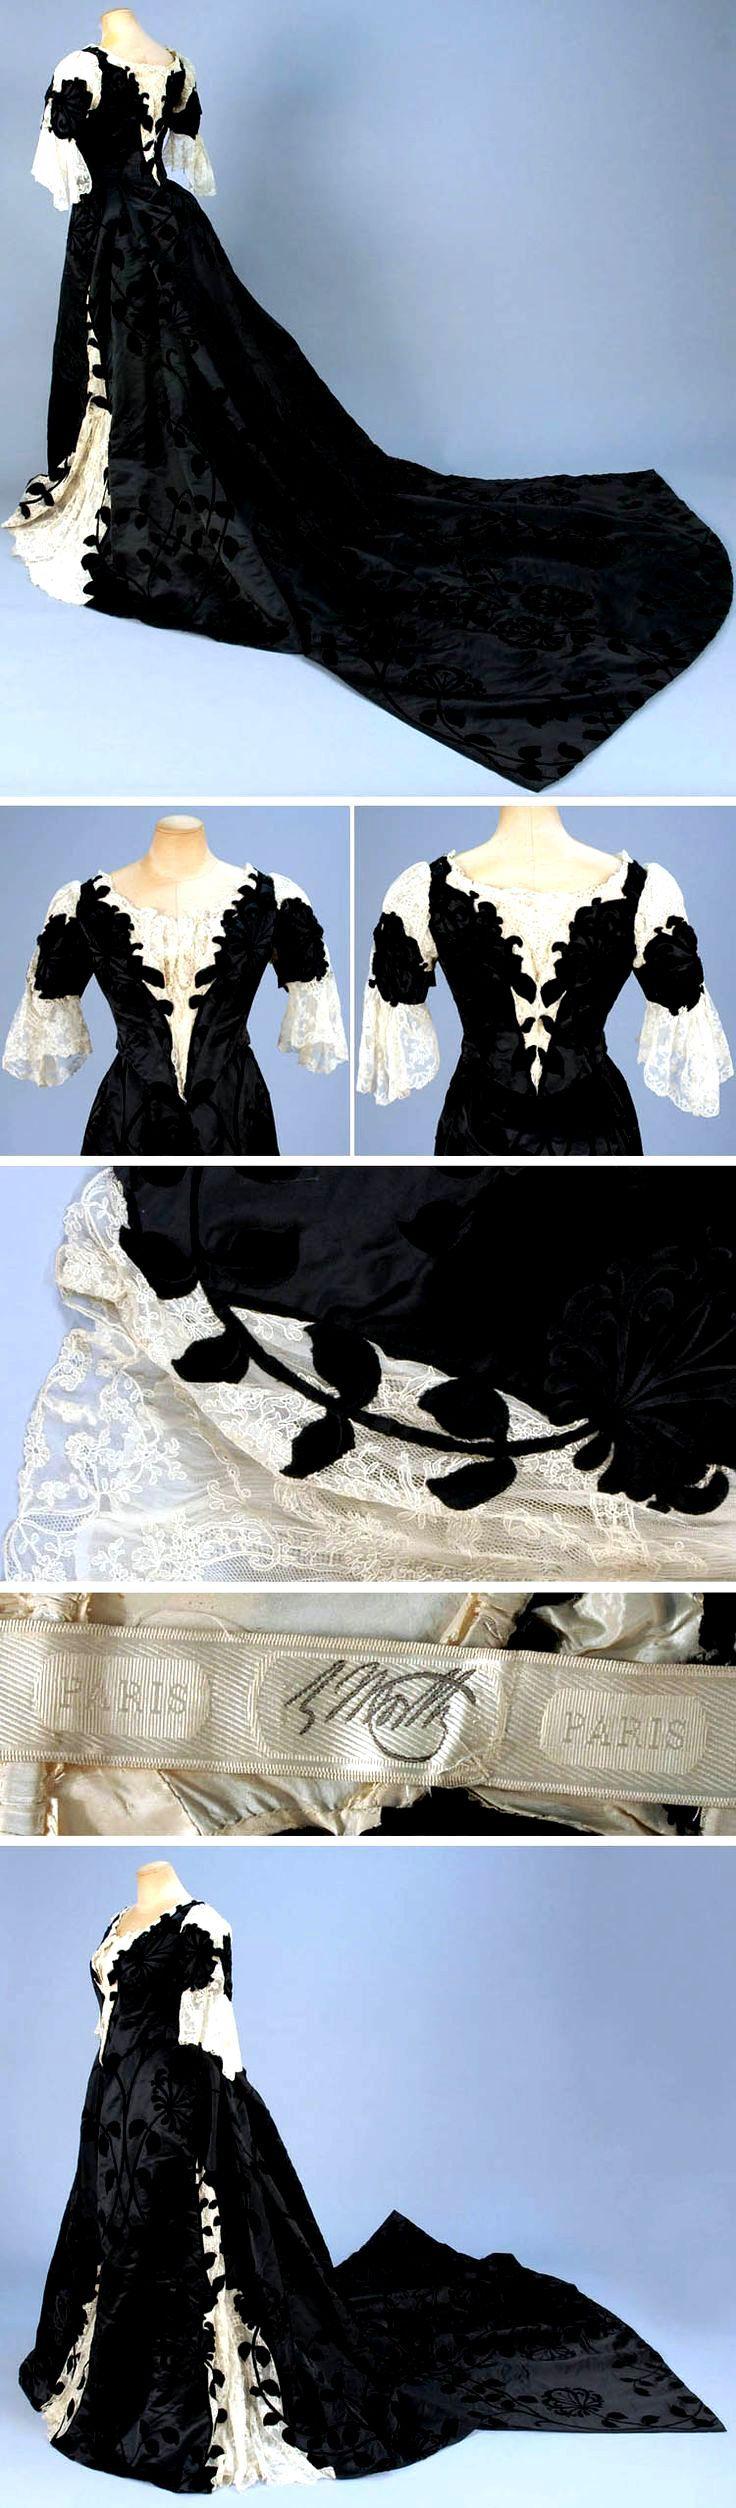 HISTORICAL BLACK & PRINTED DRESSES